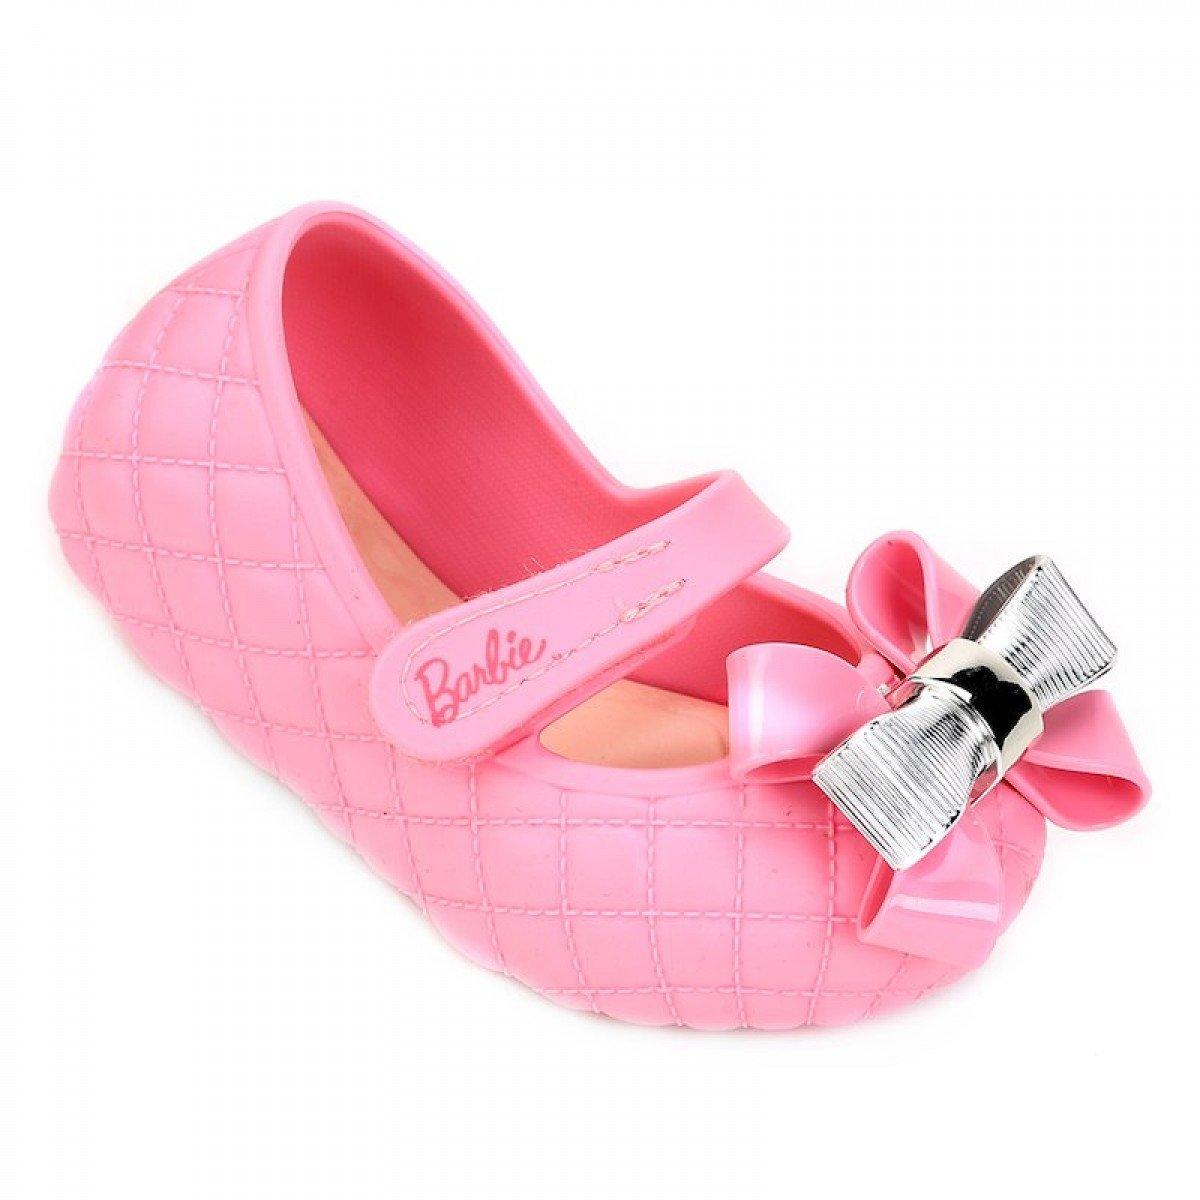 026f536fac Sapatilha Infantil Grendene Barbie Fashion Girl Baby - Compre Agora